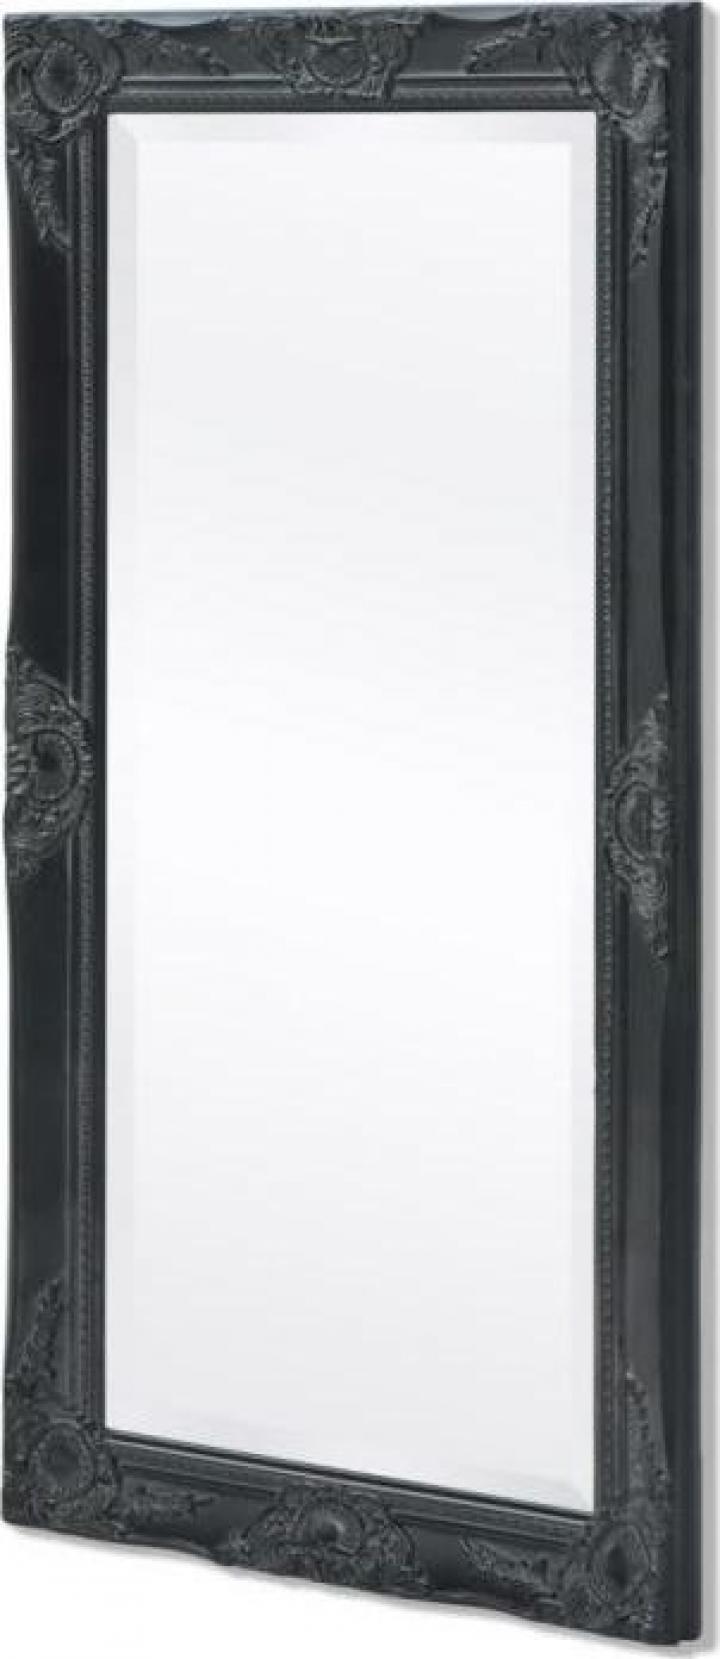 Oglinda de perete baroc, 100 x 50 cm, negru